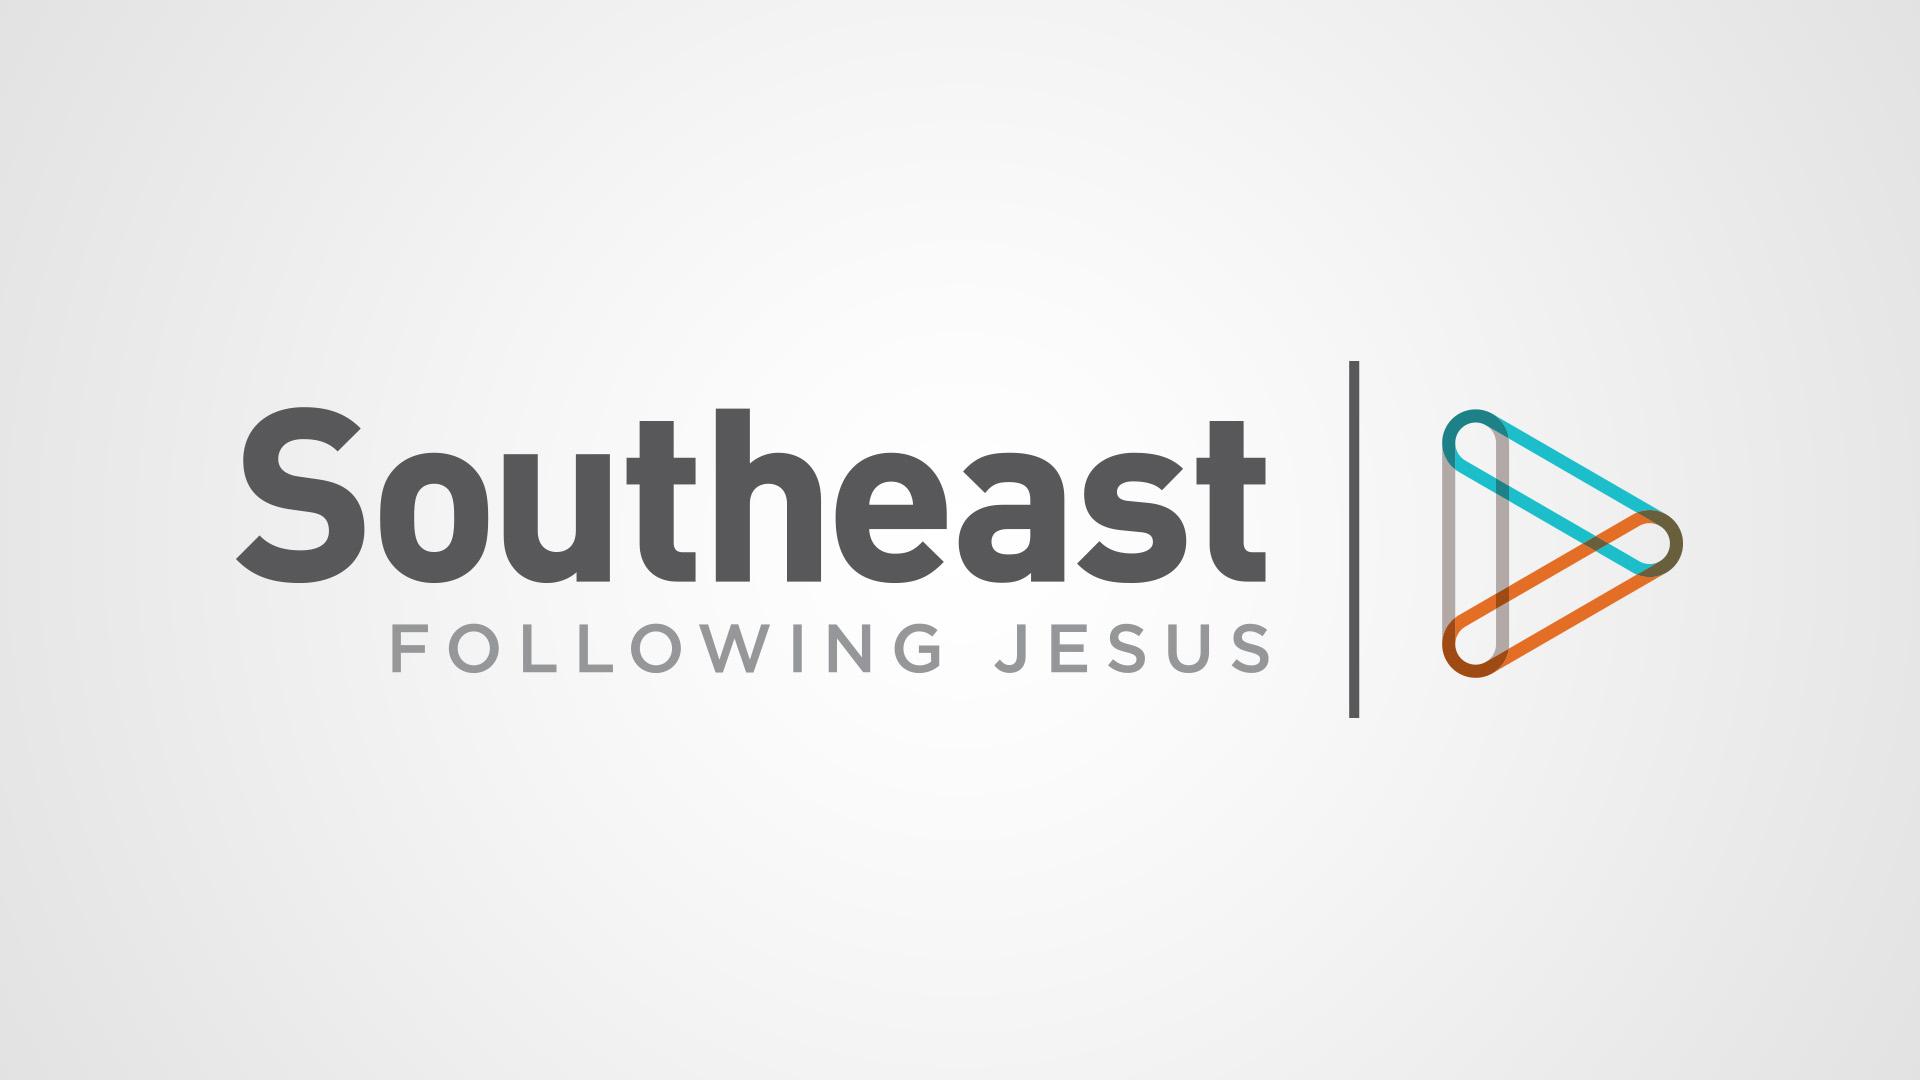 rebrand-logo1.jpg